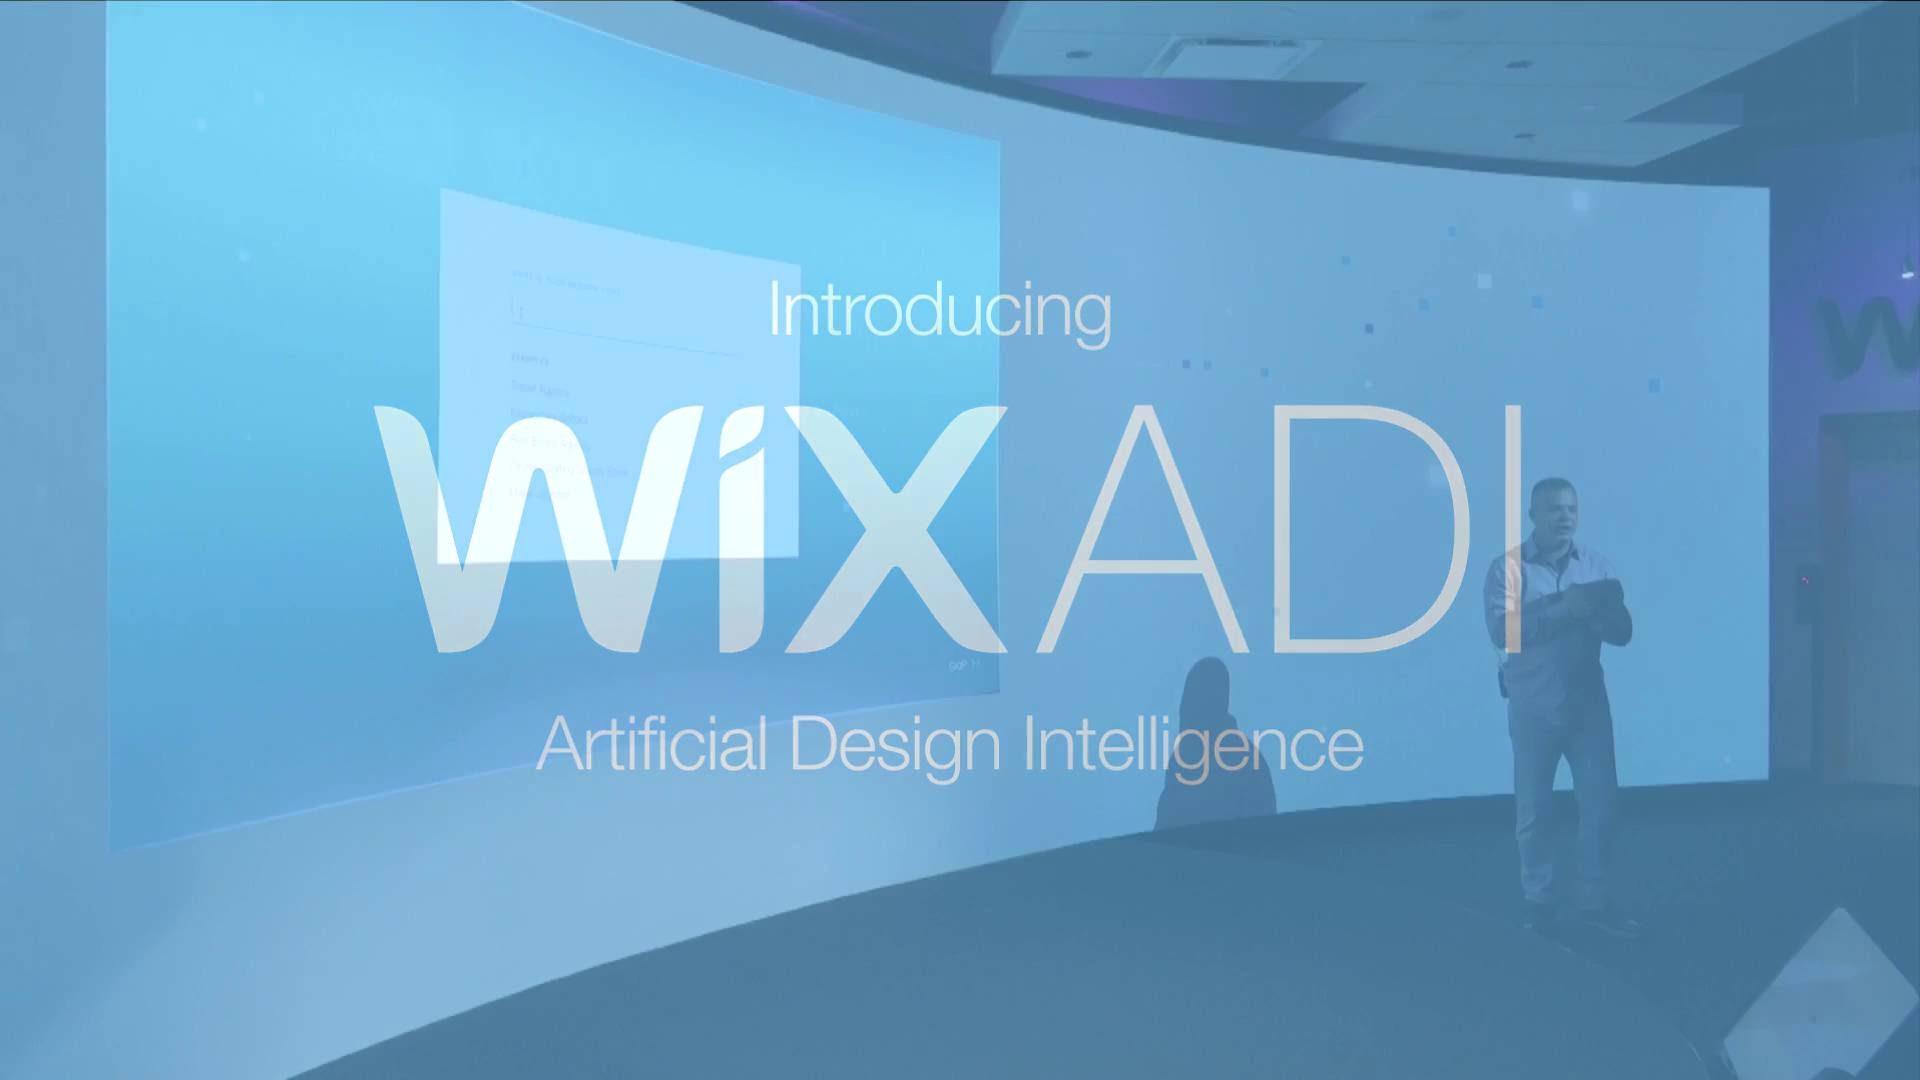 Wix ADI revolutionizes the way websites are built | KnowTechie